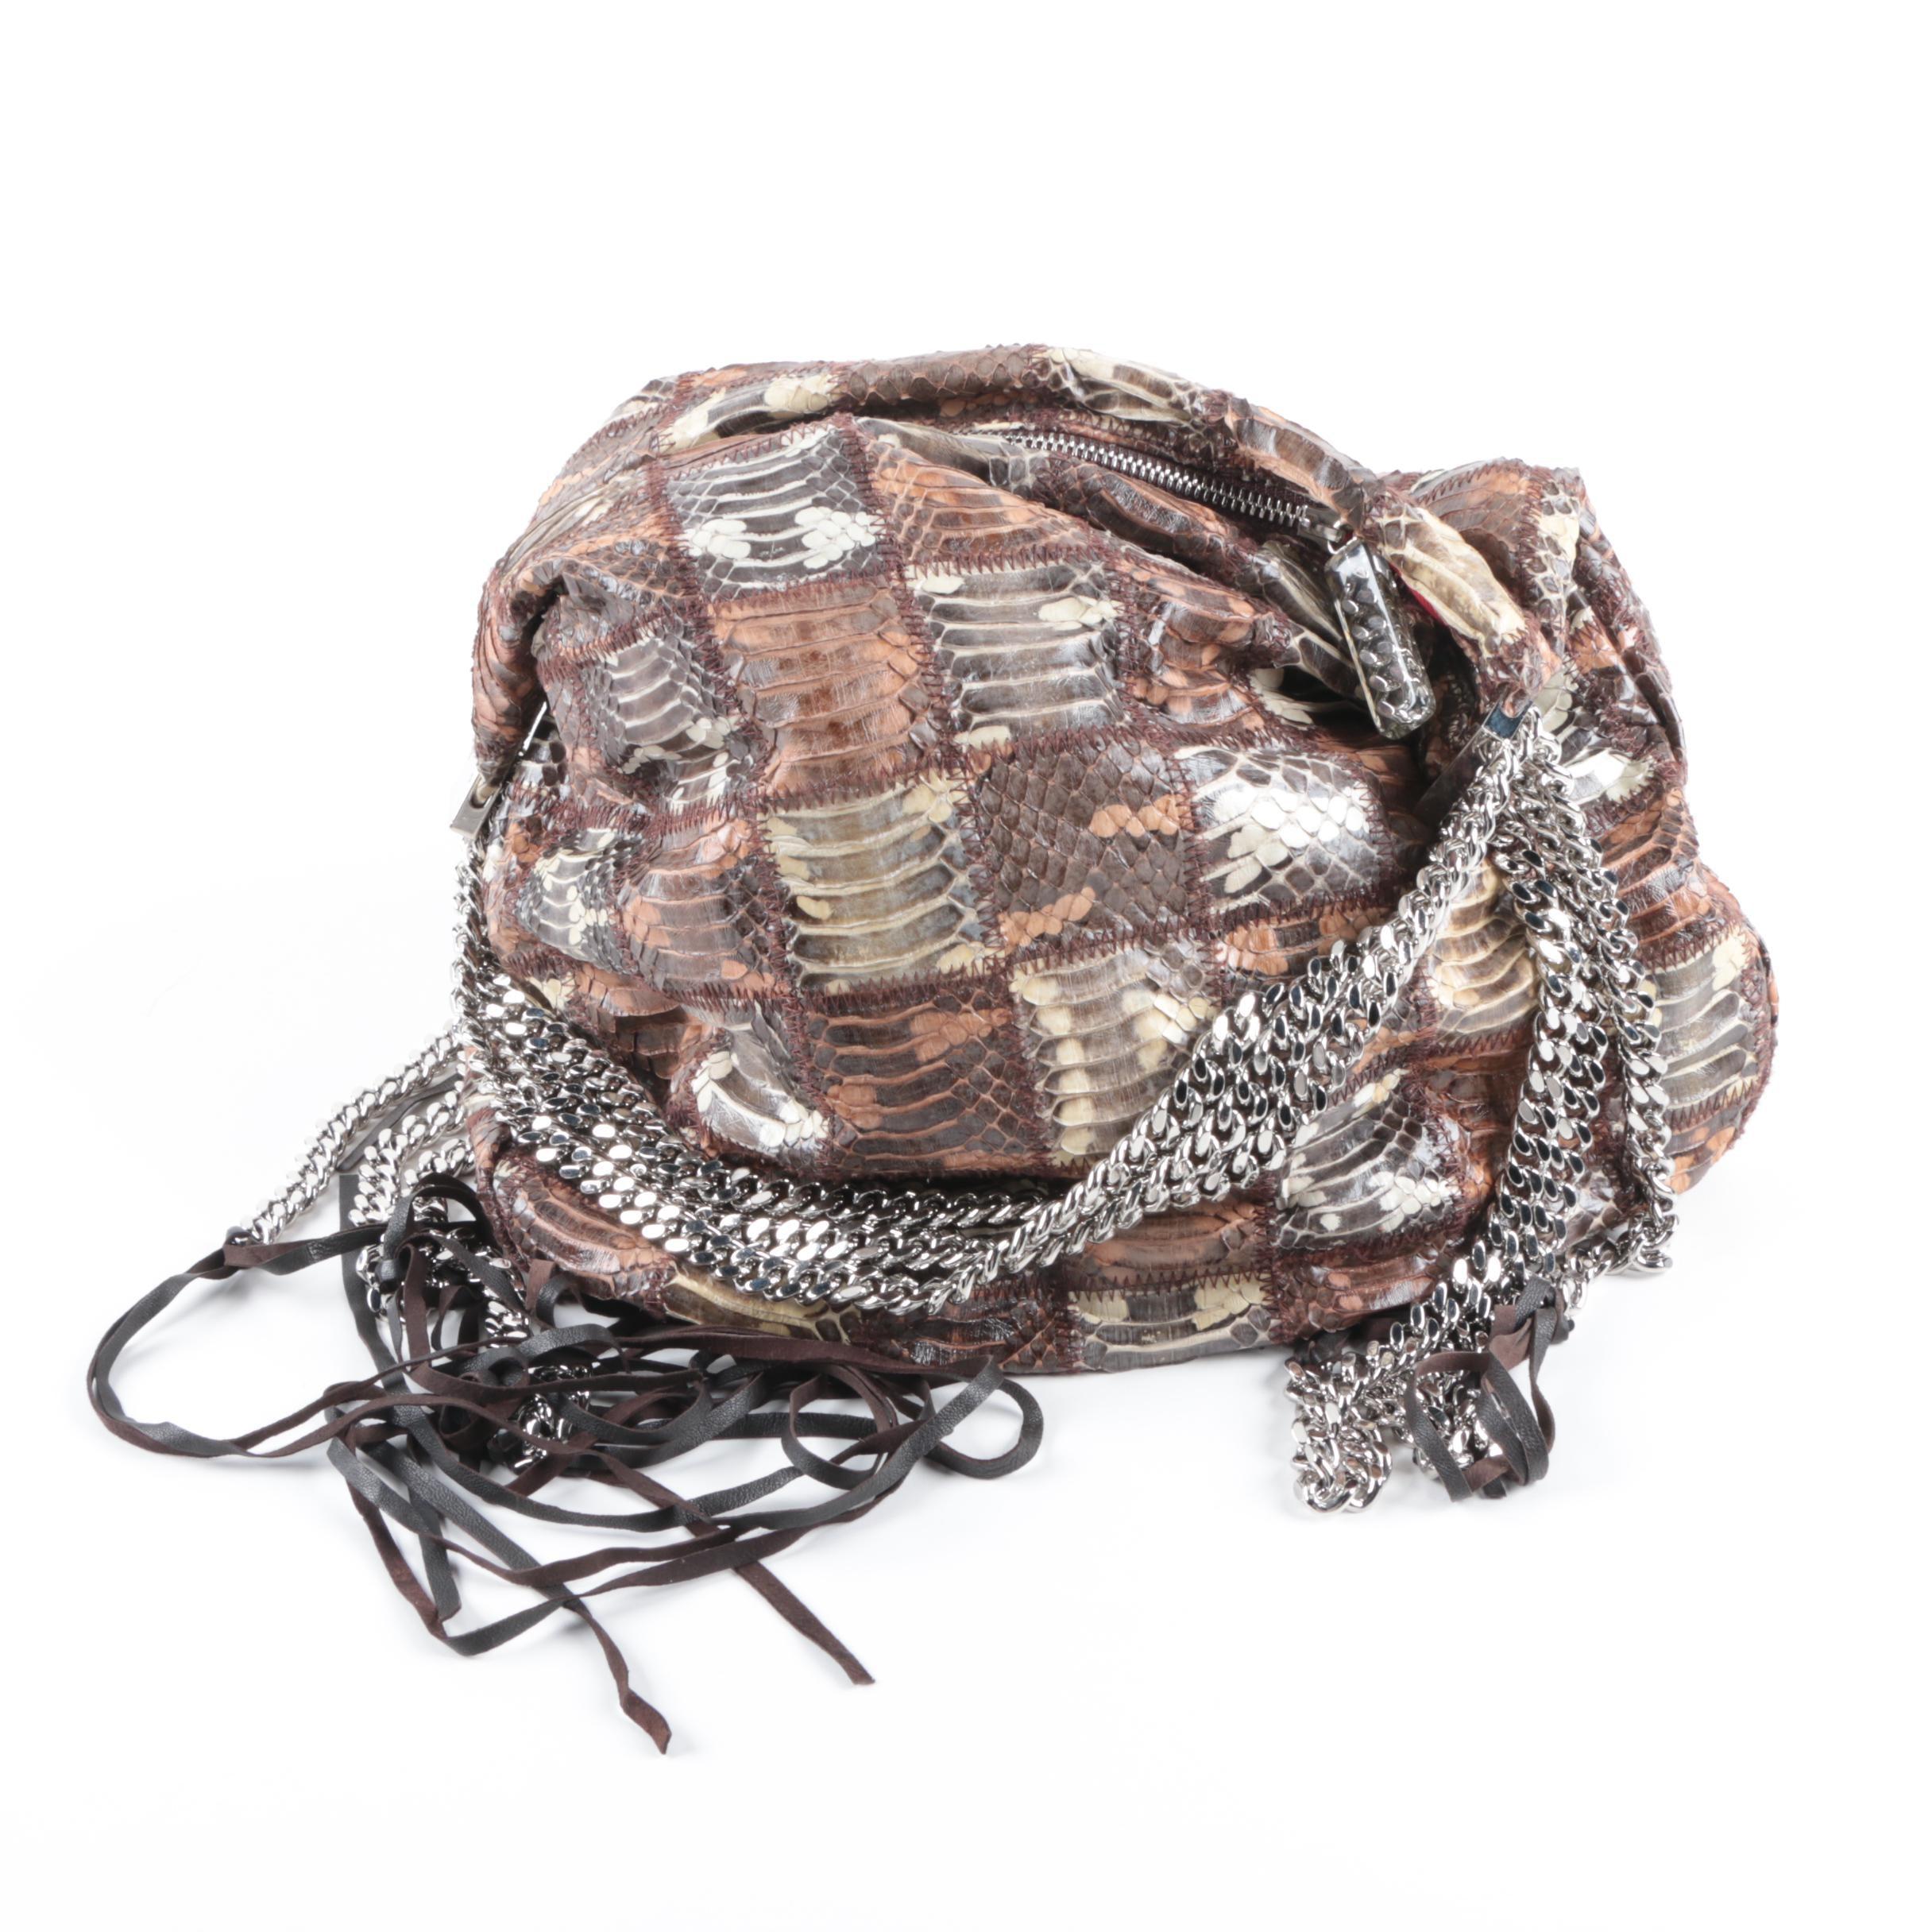 Christian Louboutin Patchwork Snakeskin Marianna Biker Hobo Bag